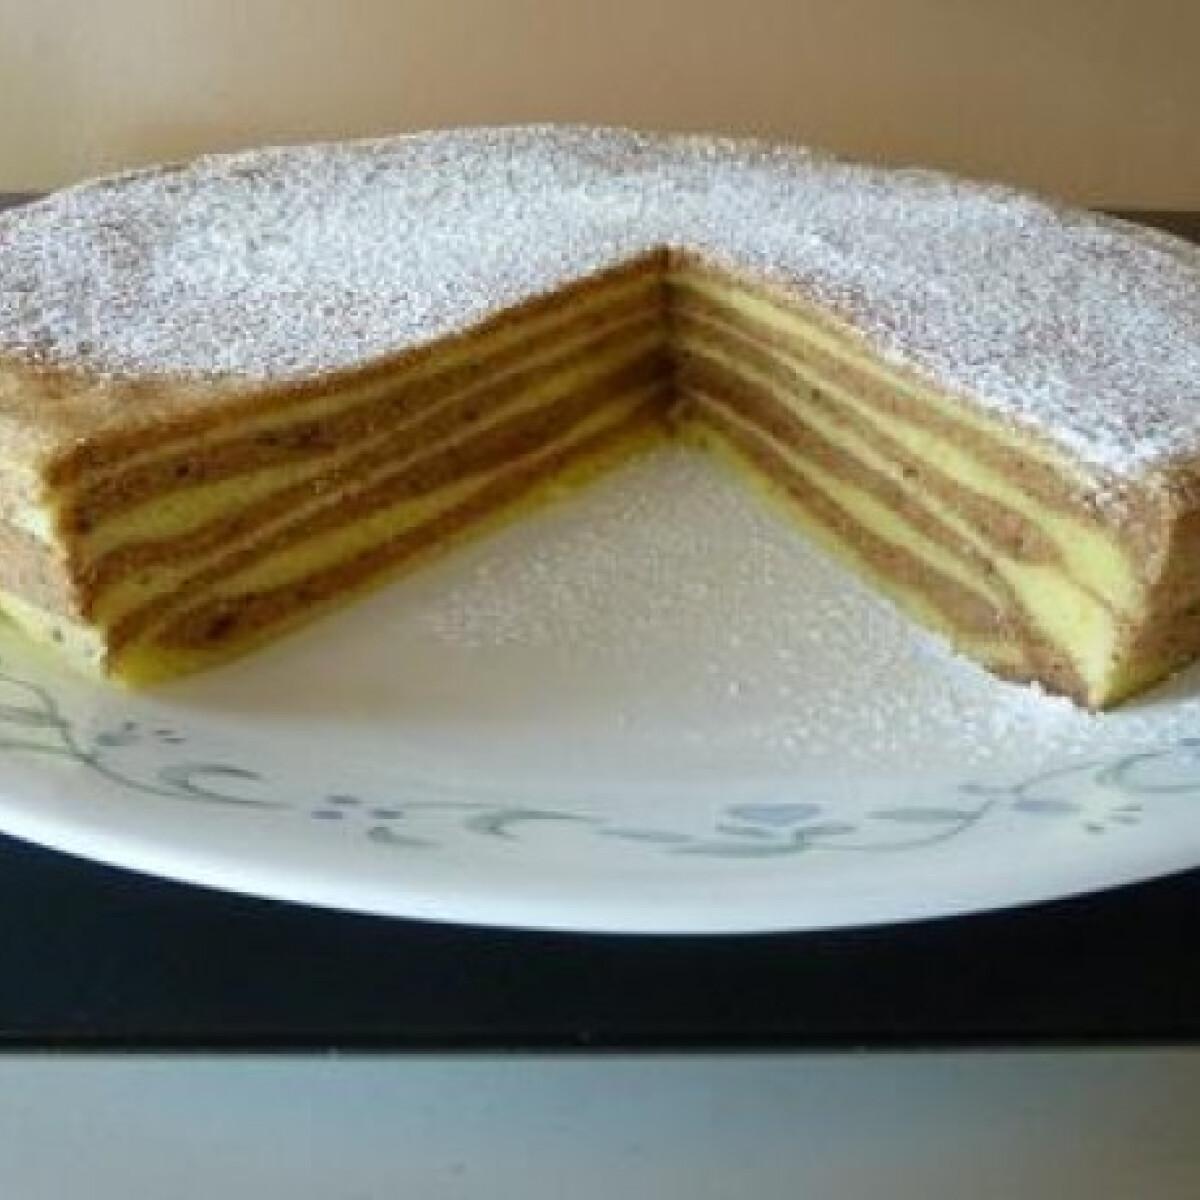 Grillezett torta